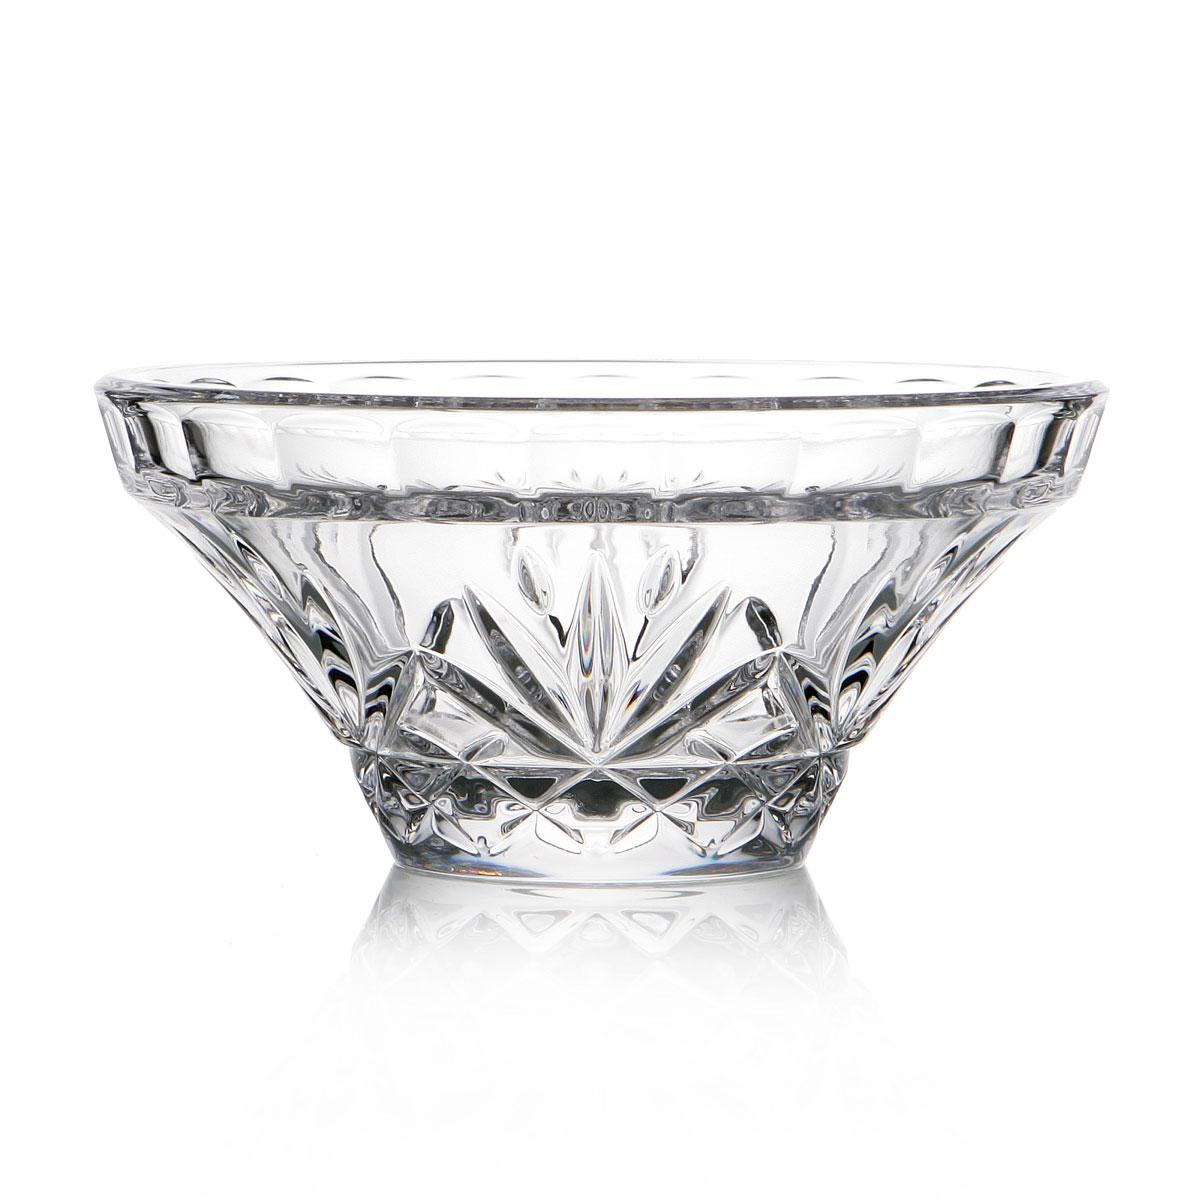 "Cashs Ireland, Annestown 6"" Crystal Bowl"